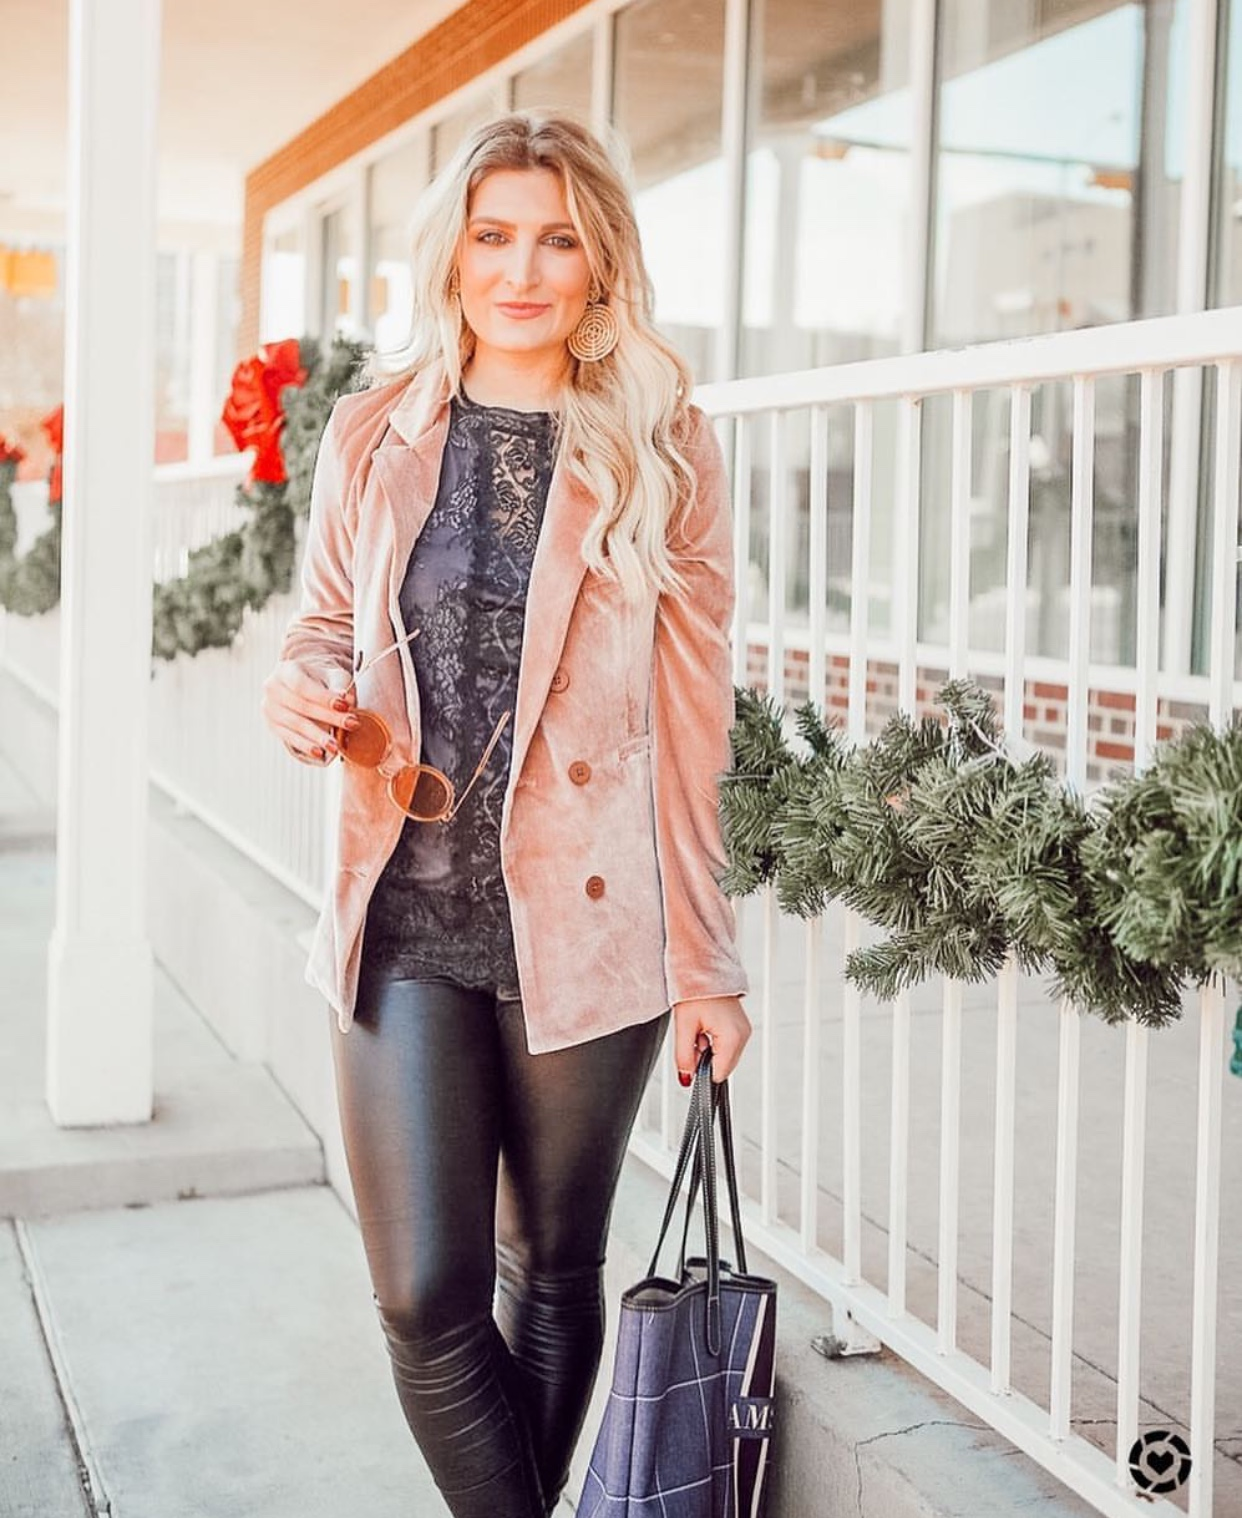 Velvet blazer | Affordable work fashion | Audrey Madison Stowe a fashion and lifestyle blogger